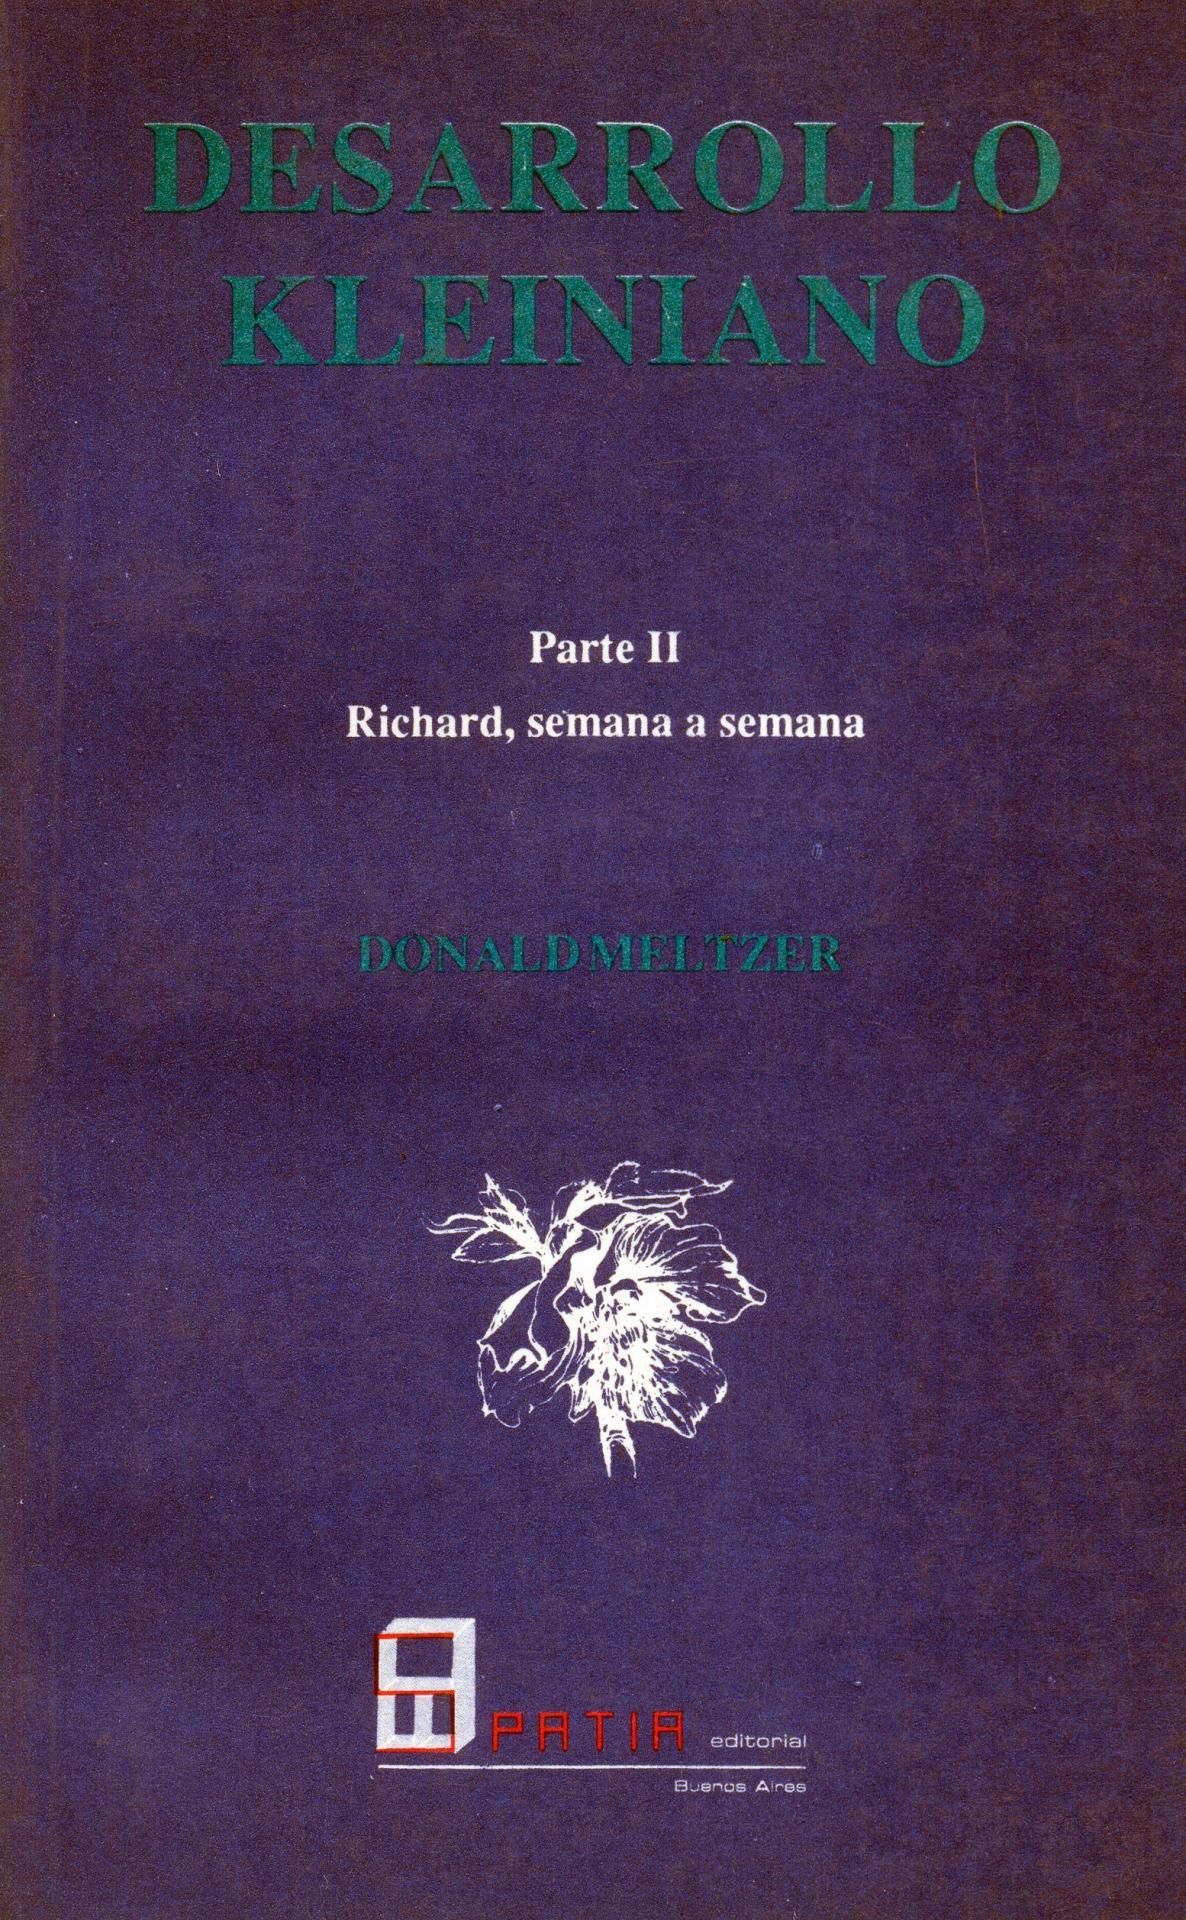 DESARROLLO KLEINIANO. Parte II.  Richard, semana a semana.  Meltzer, D.